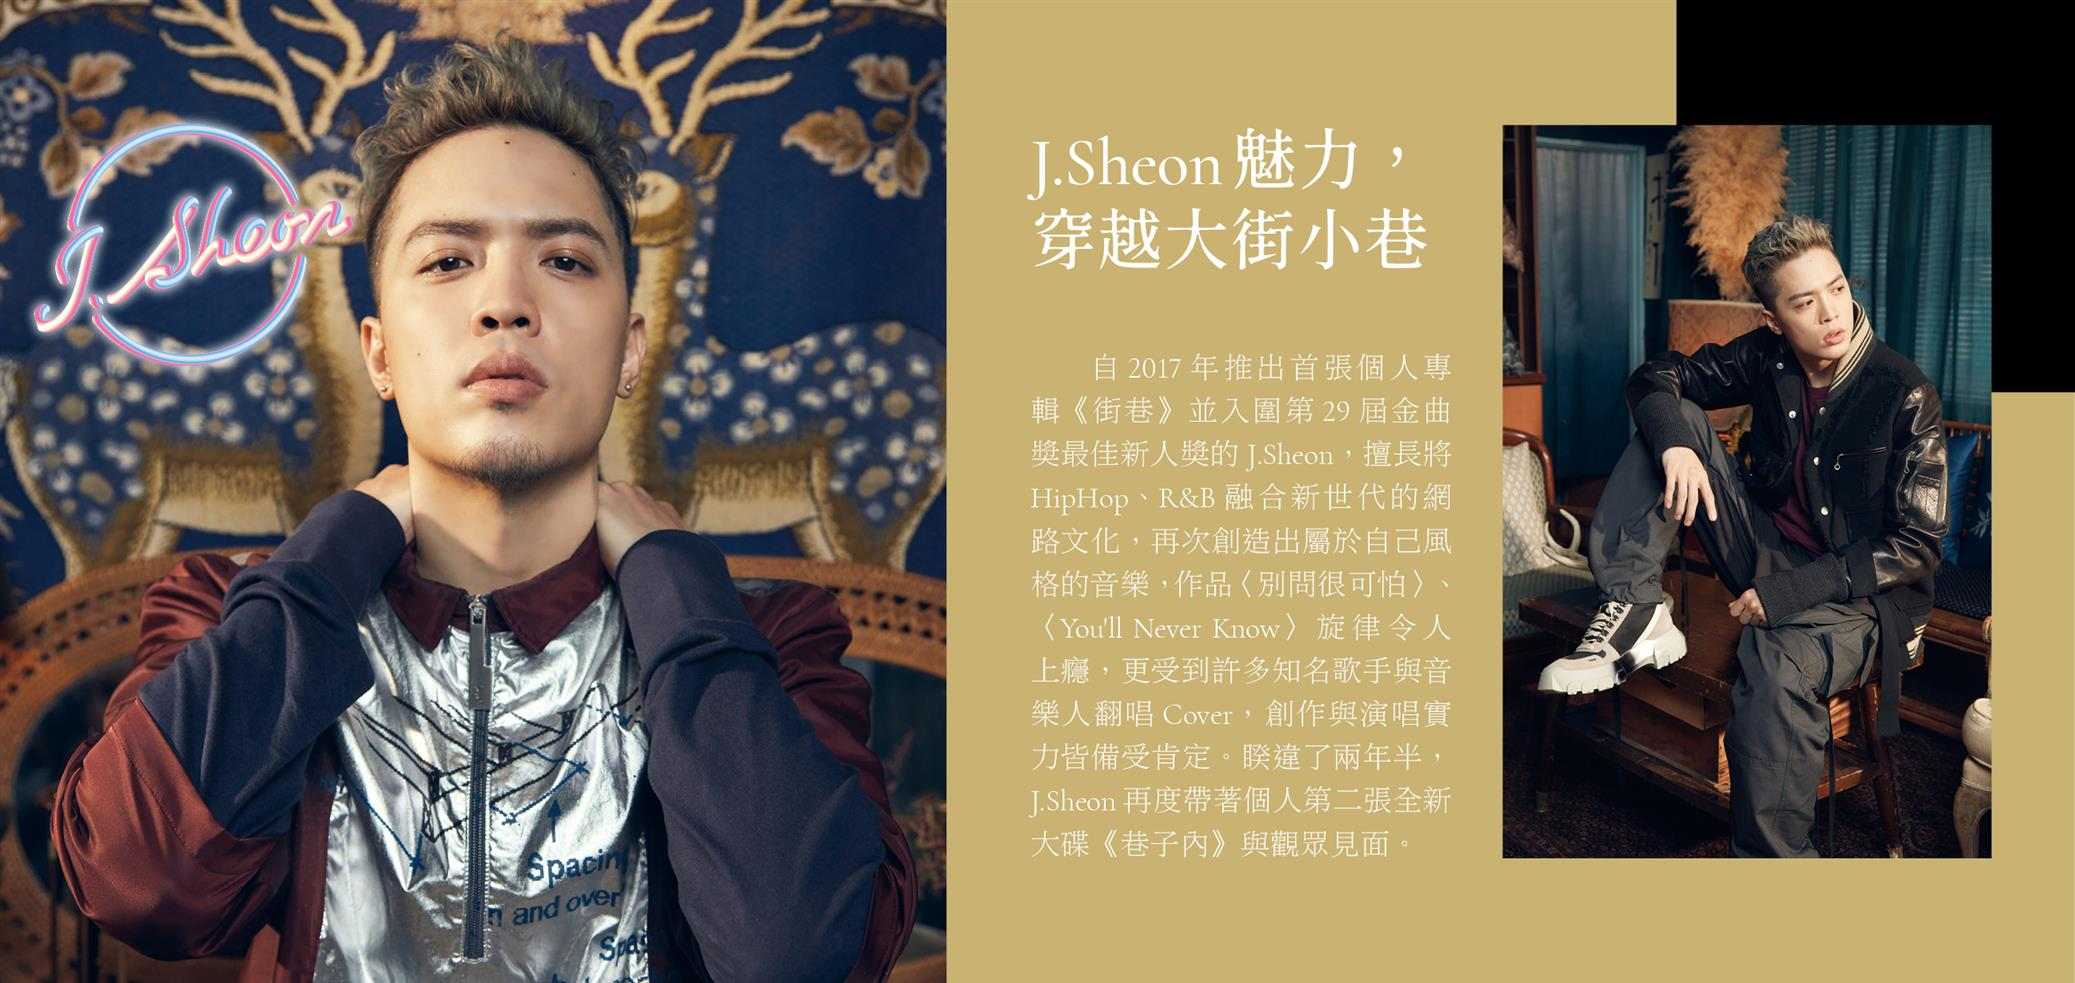 J.Sheon 適時的不猶豫不決,魅力穿越大街小巷